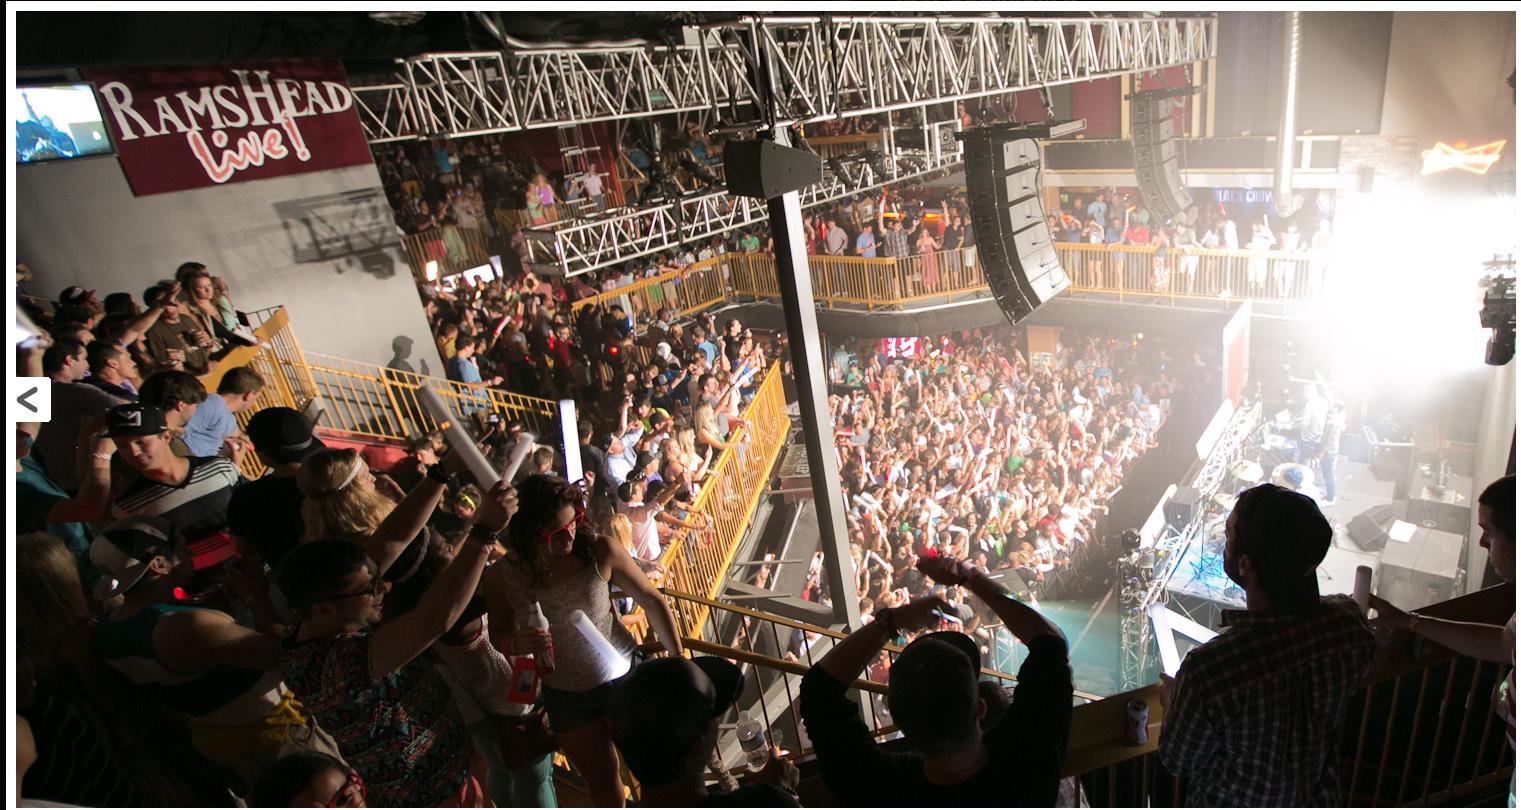 Ramshead Live Venue Music Venue Concert Venue Ram Head